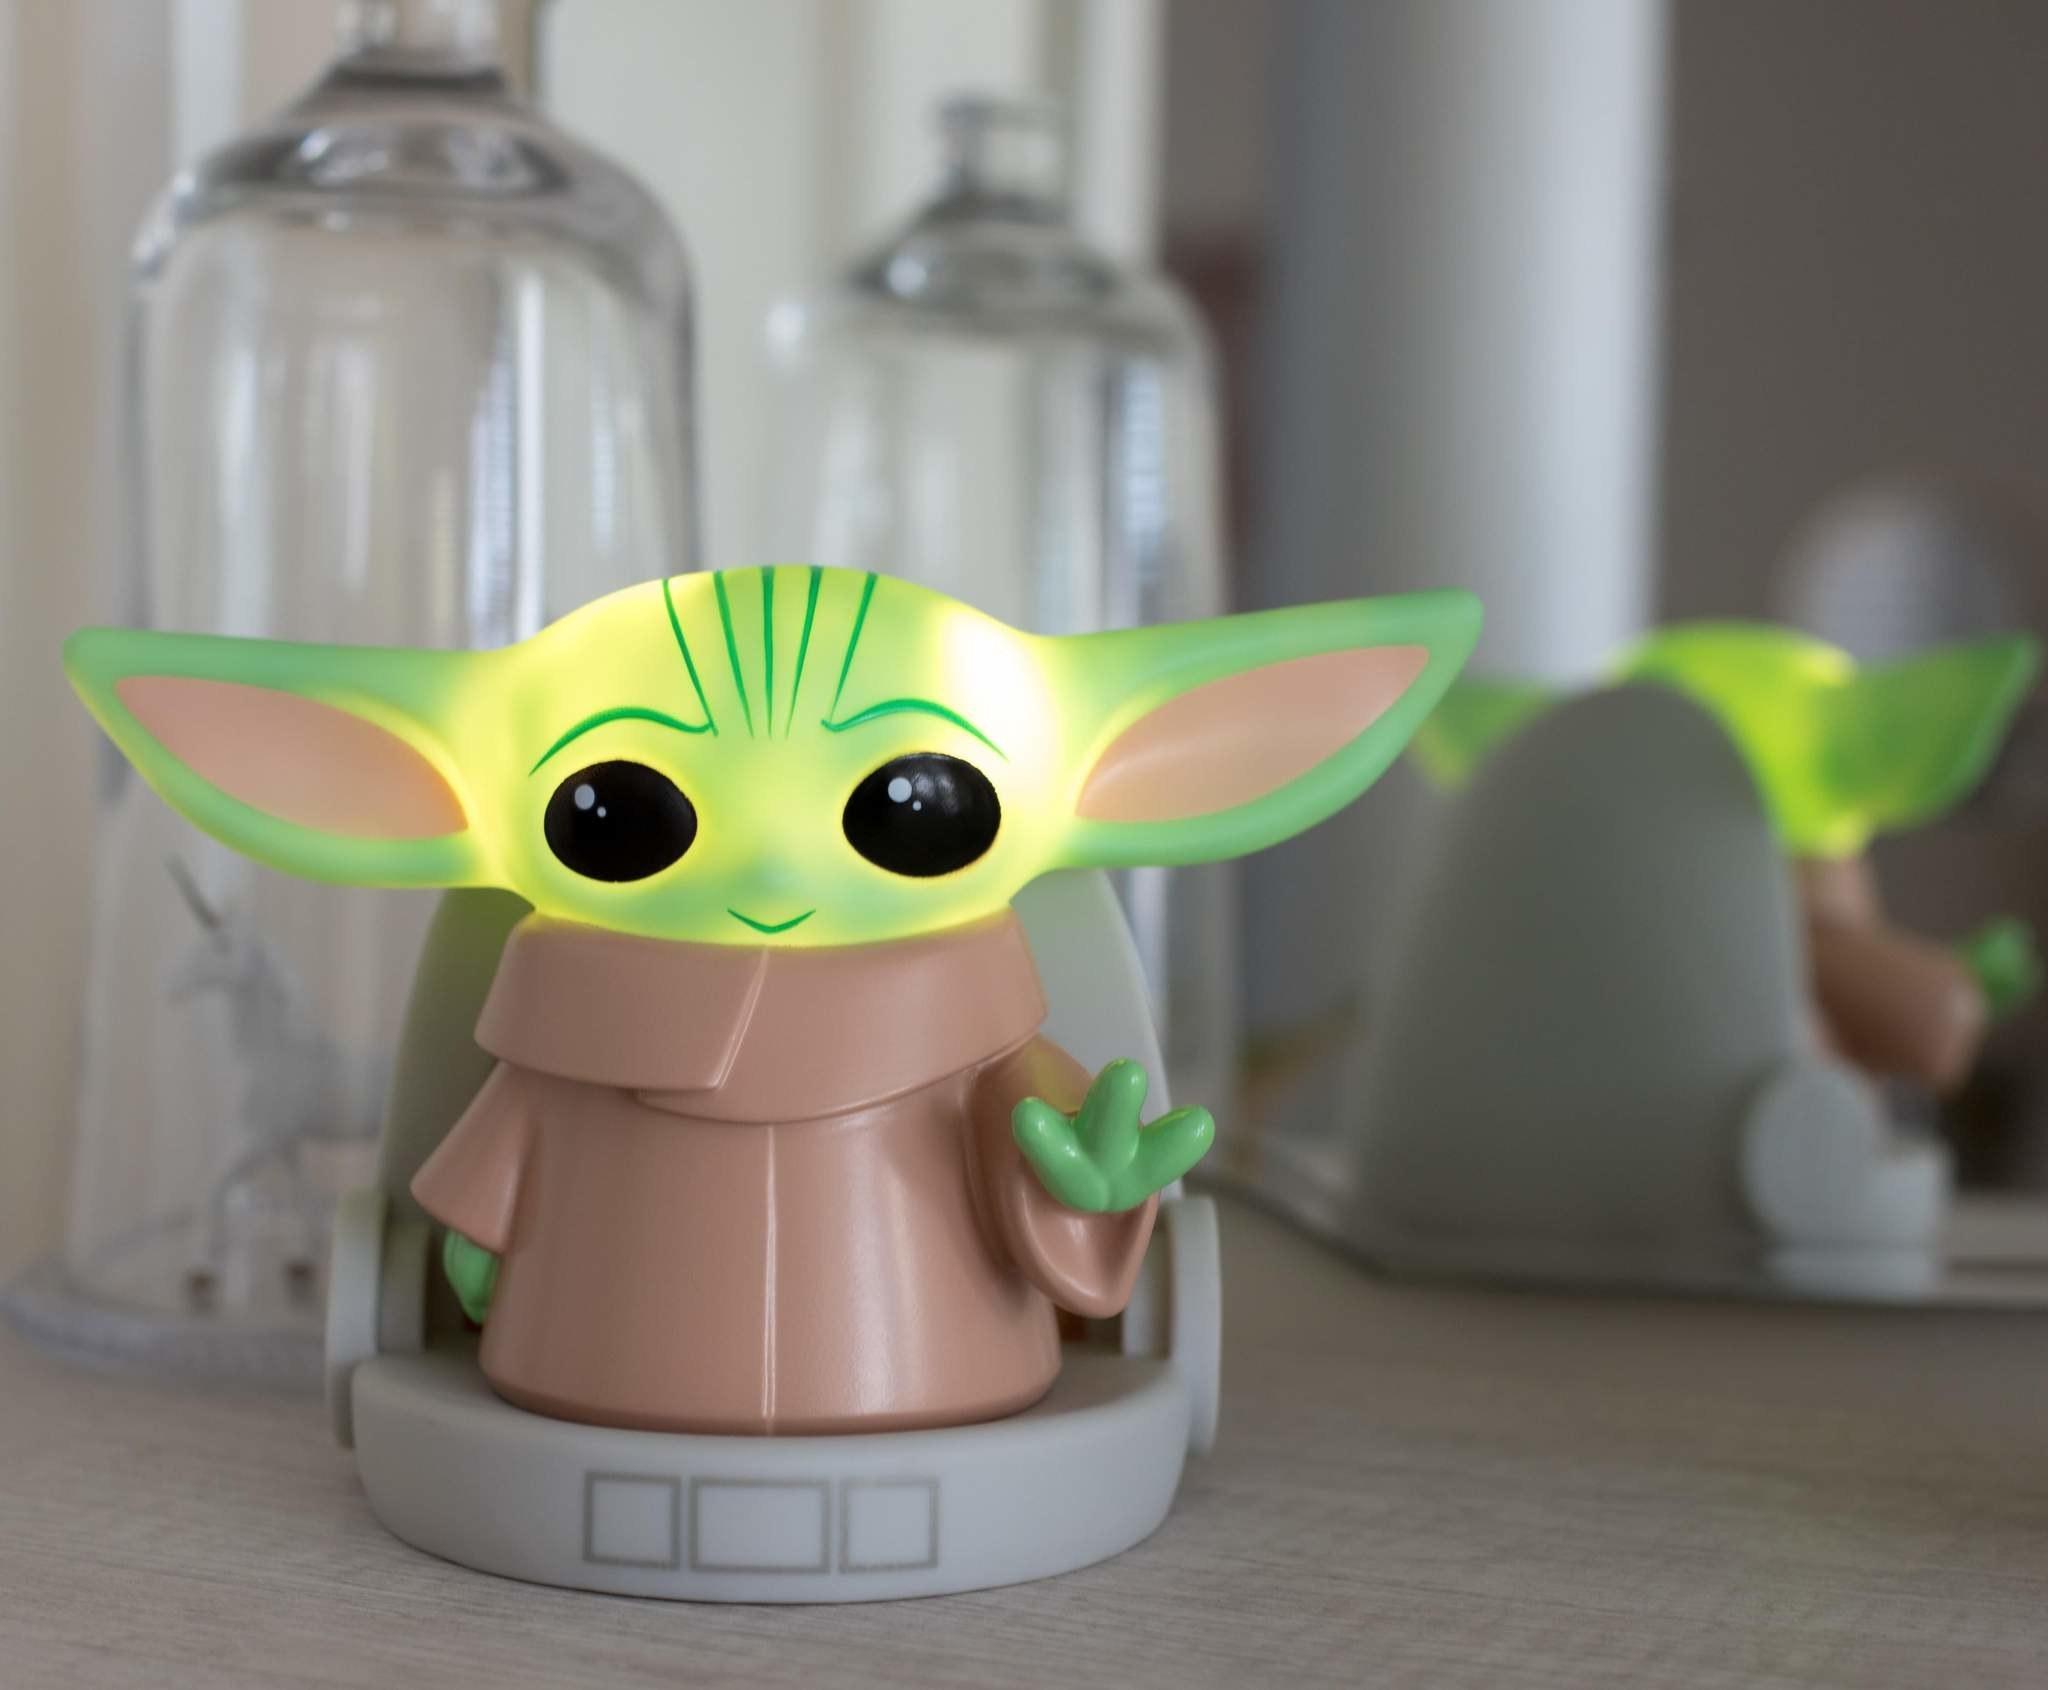 The Child mini desk lamp placed on desk